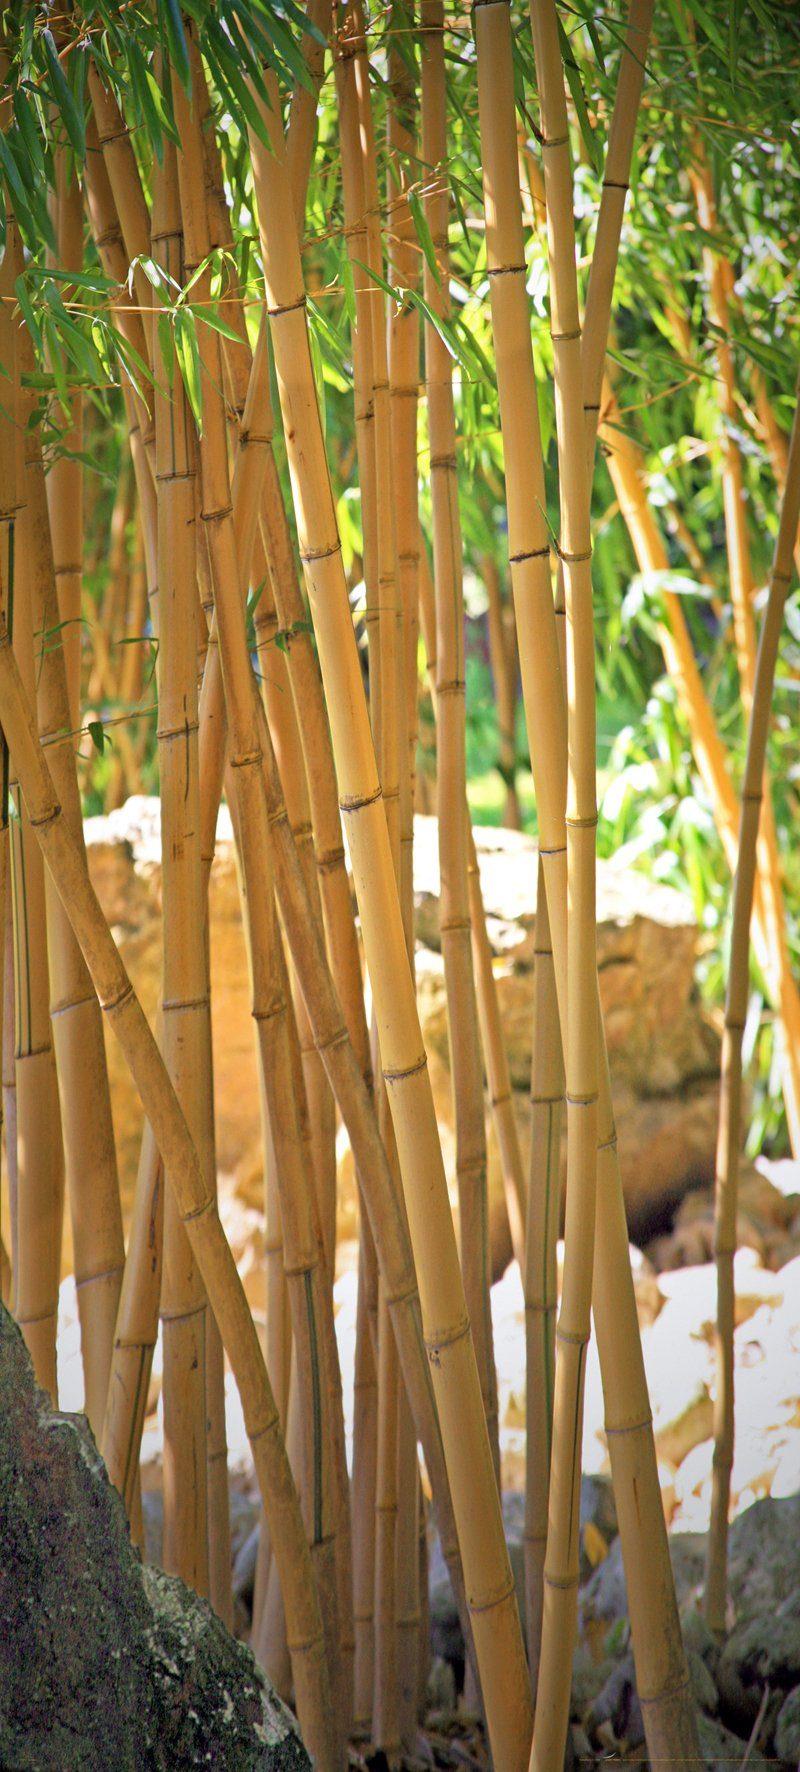 PAPERMOON Fototapete »Bamboo - Türtapete«, BlueBack, 2 Bahnen, 90 x 200 cm